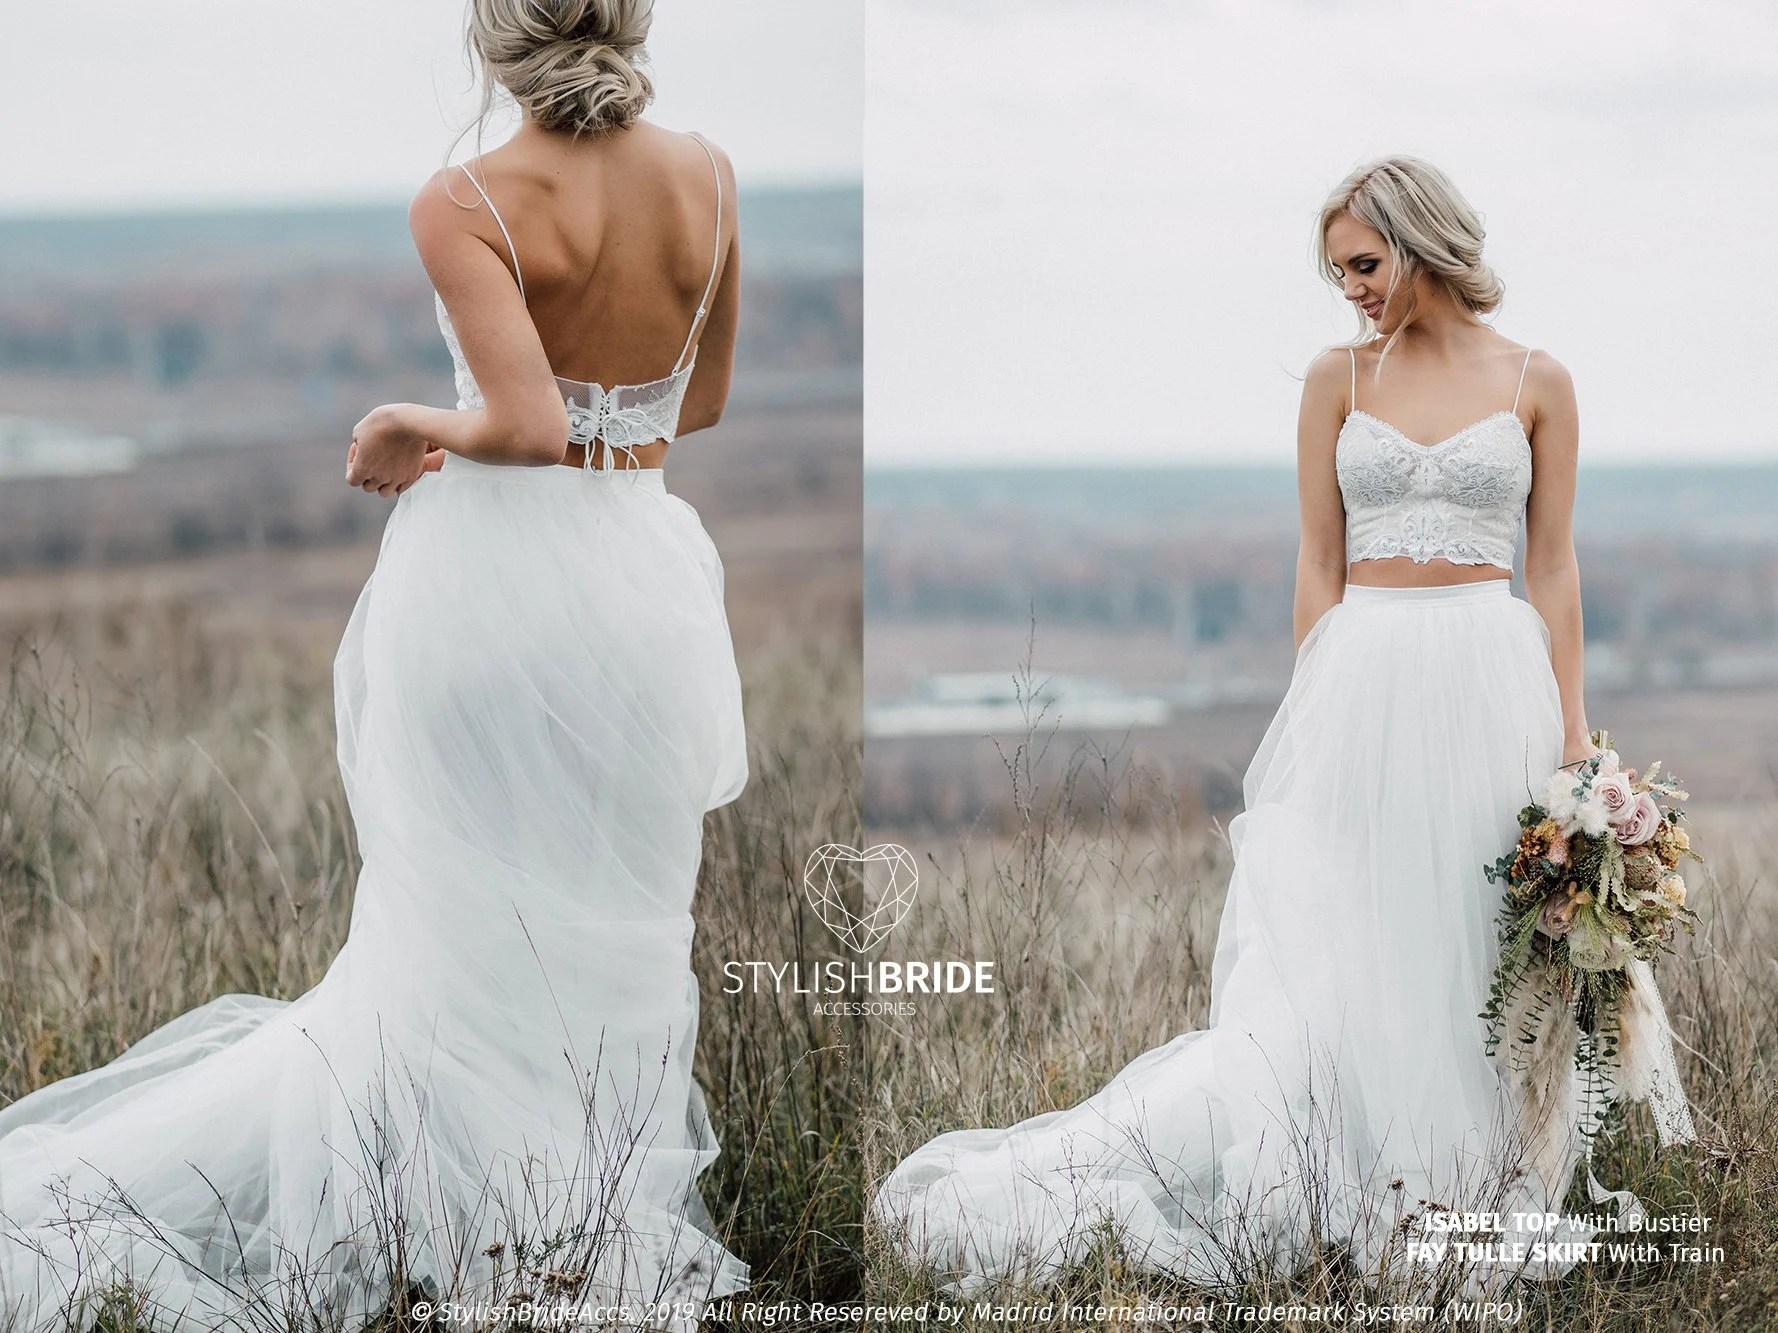 Isabel Boho Wedding Dress With Spaghetti Straps 3 Pieces